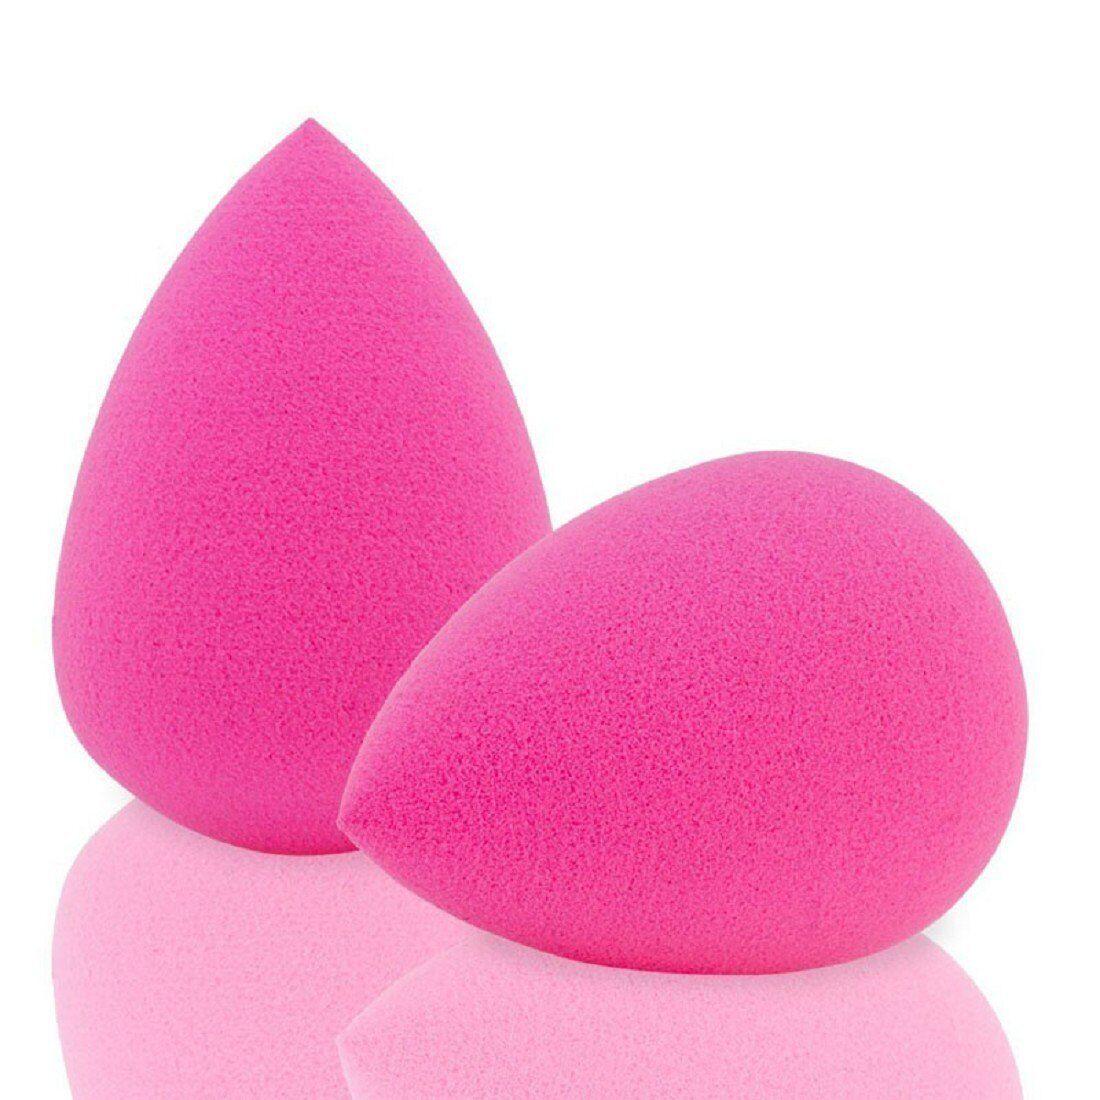 2 Pcs Pro Beauty Flawless Makeup Blender Foundation Puff Sponges Rose Pink